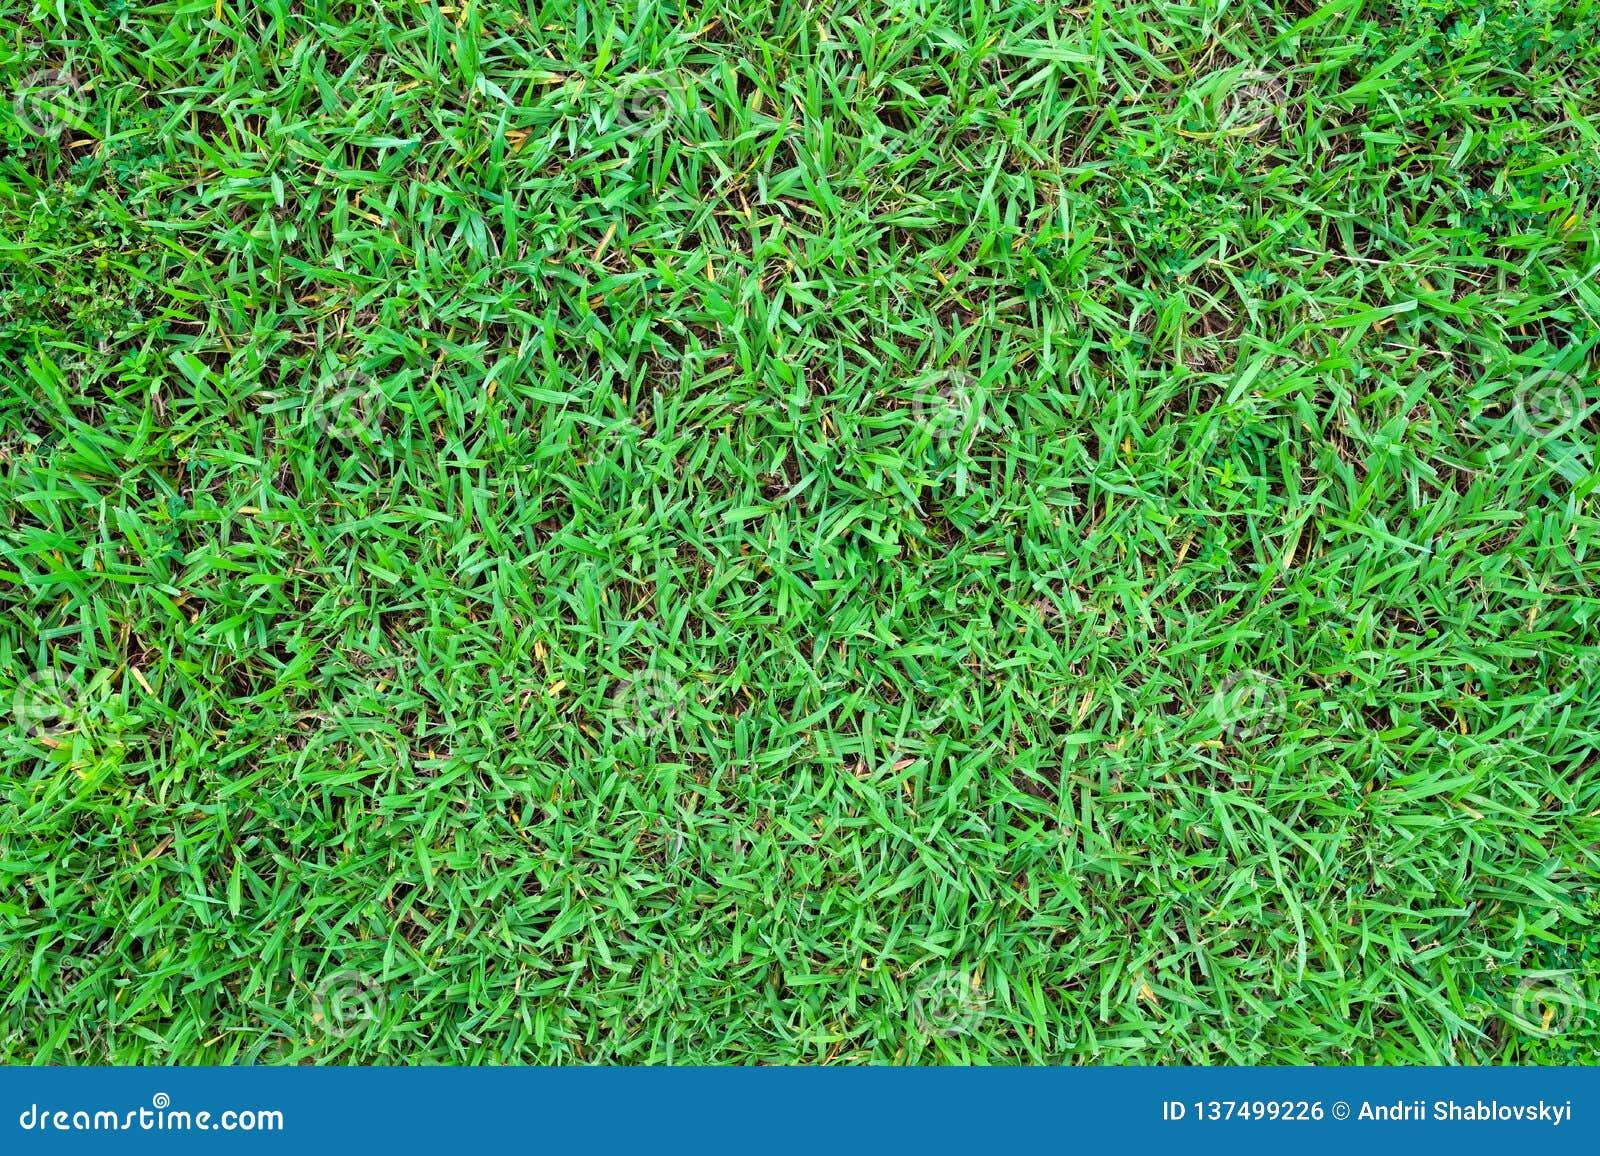 Green grass texture background. Top view